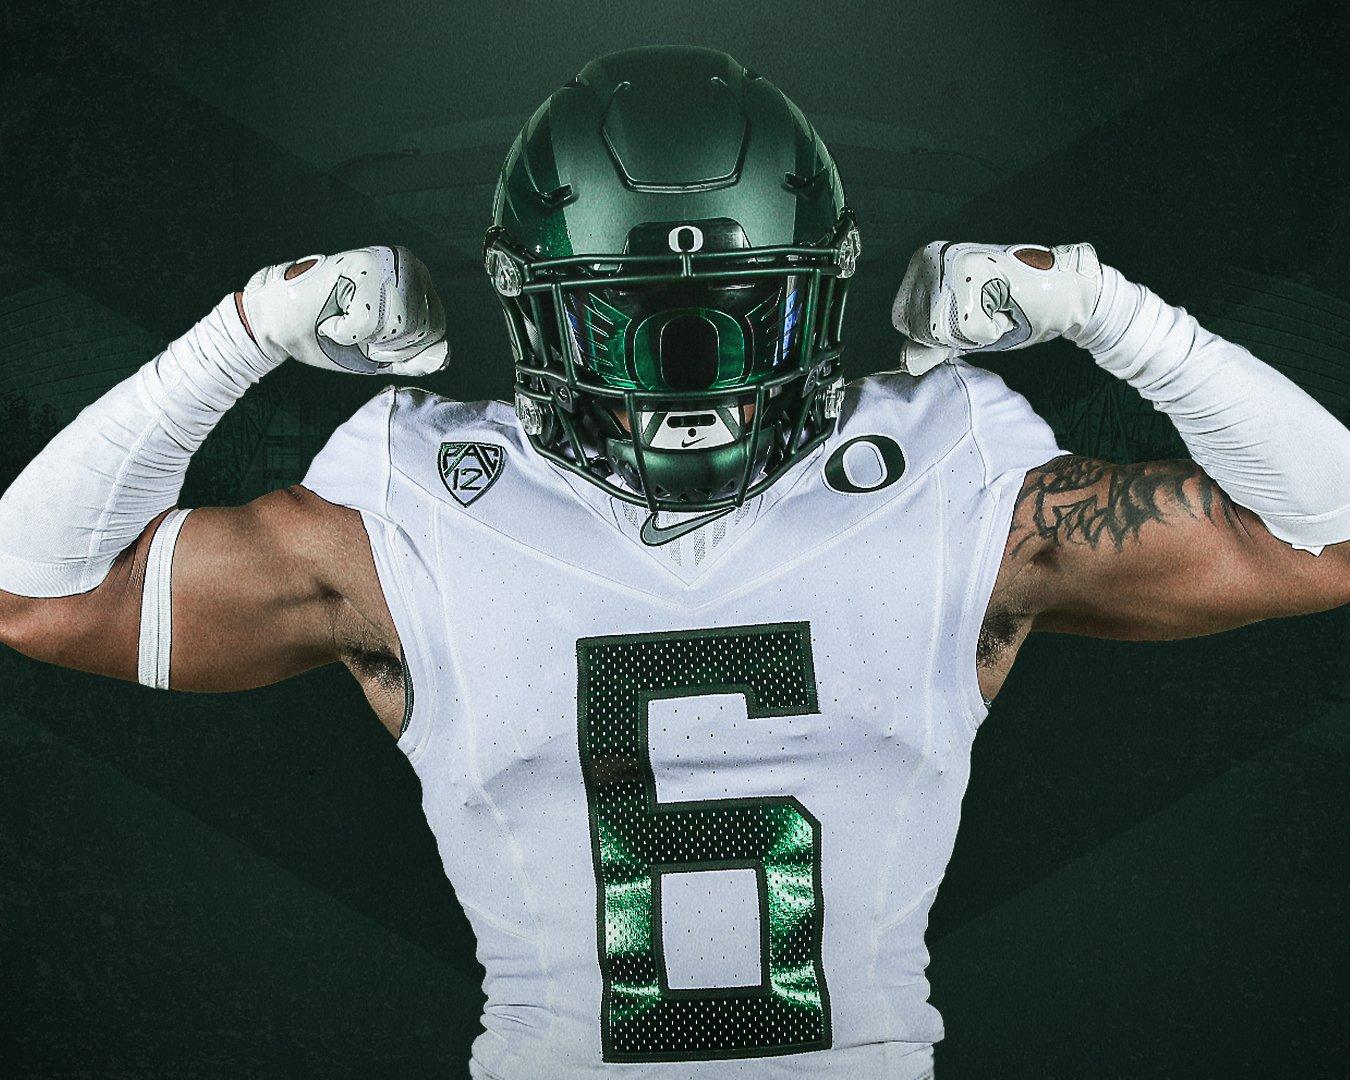 reputable site c0052 e71cd Oregon Week 1 Uniform Combo — UNISWAG